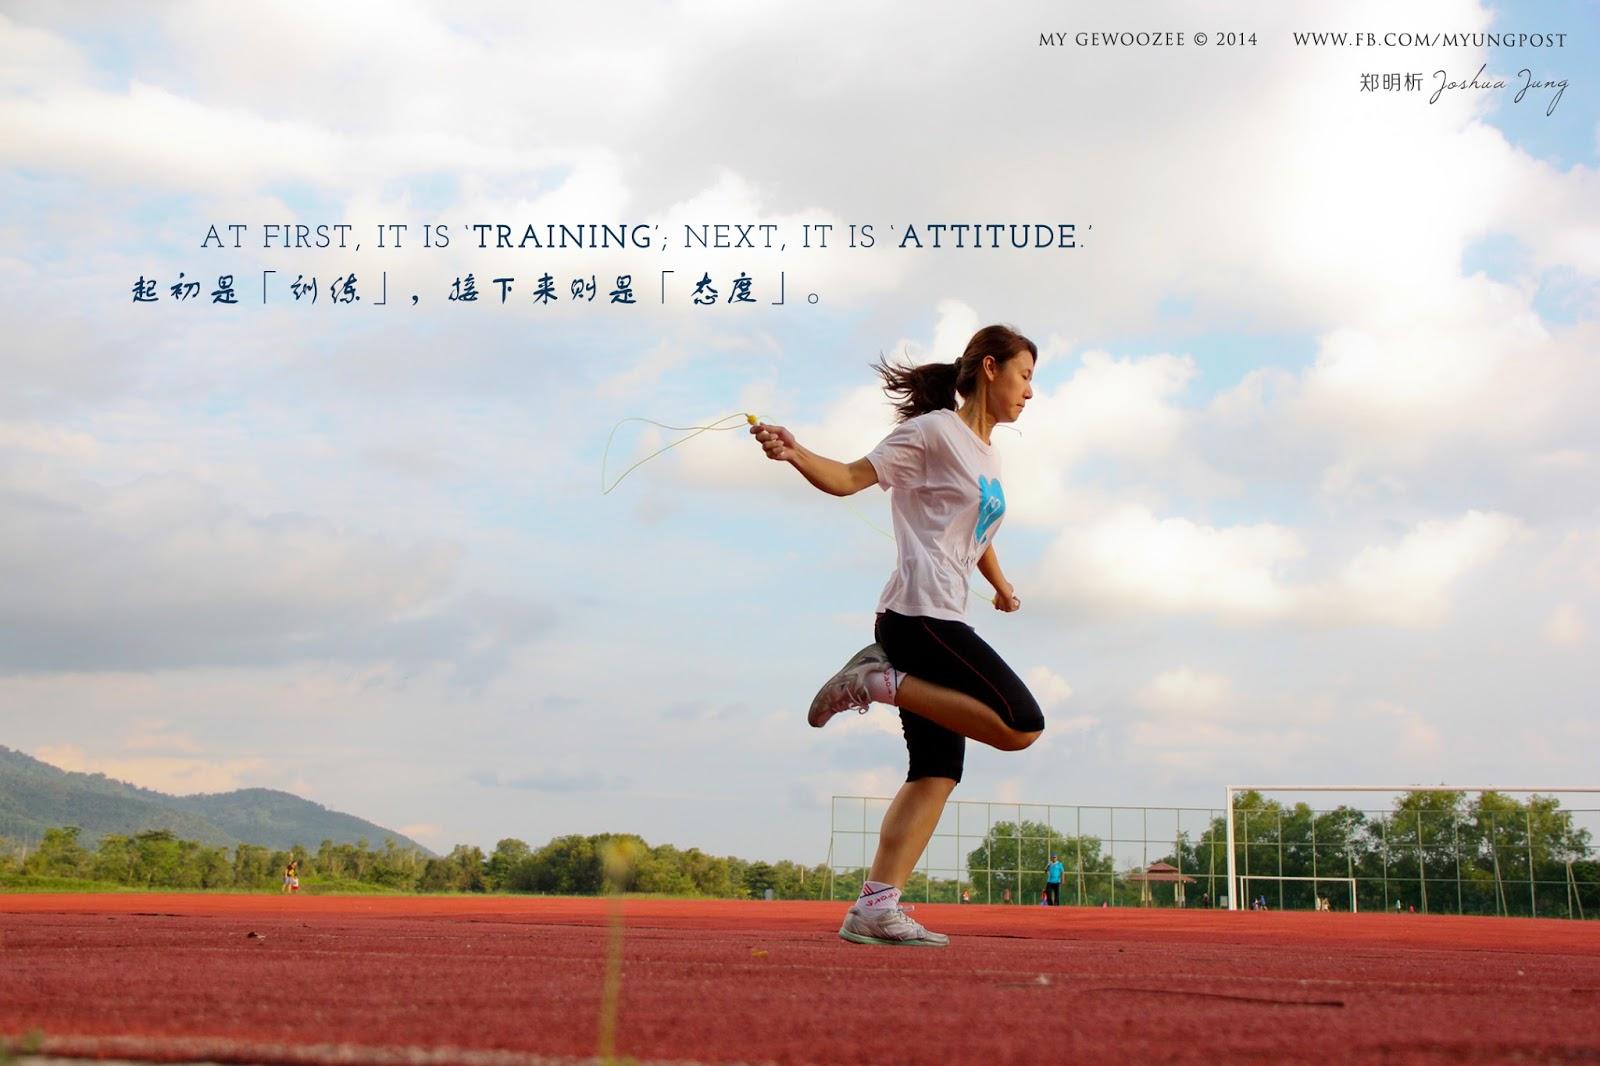 郑明析,摄理,月明洞,运动,运动场,跳绳,天空,训练,态度,Joshua Jung, Providence, Wolmyeong Dong, Sport, Rope, Sky, Training, Attitude